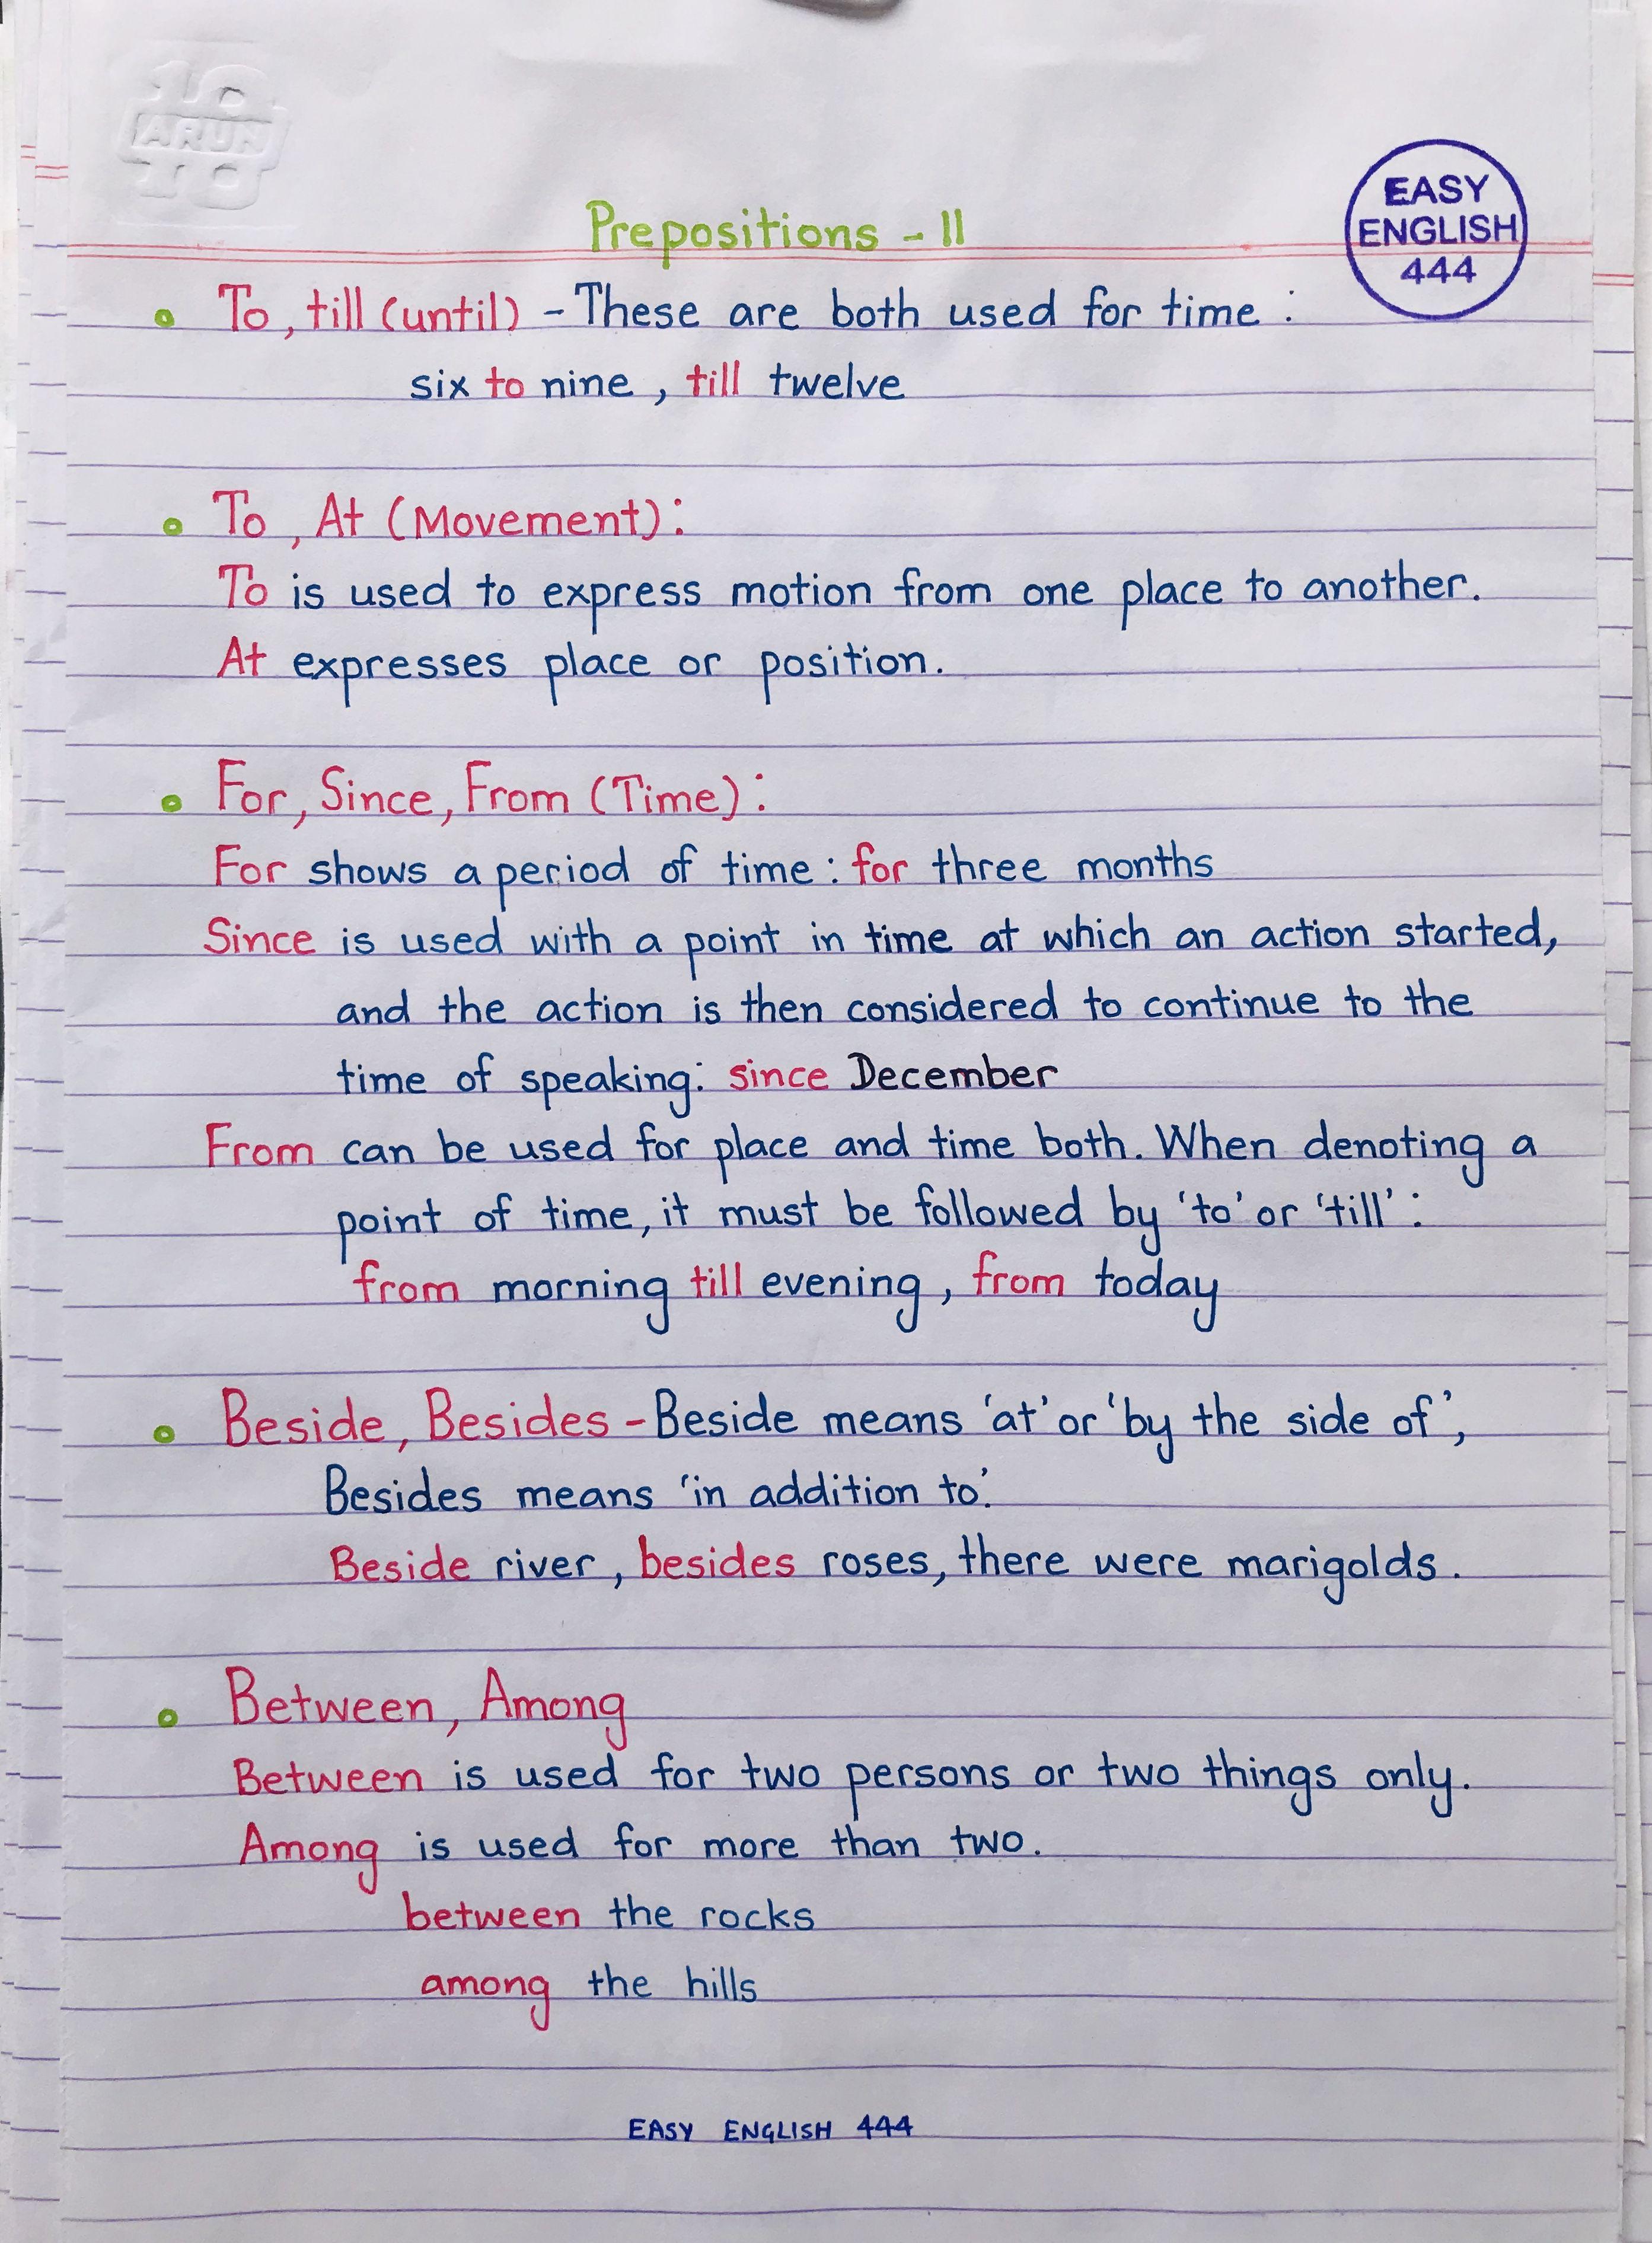 Pin By Noelia Suarez On Prepositions En Ingles With